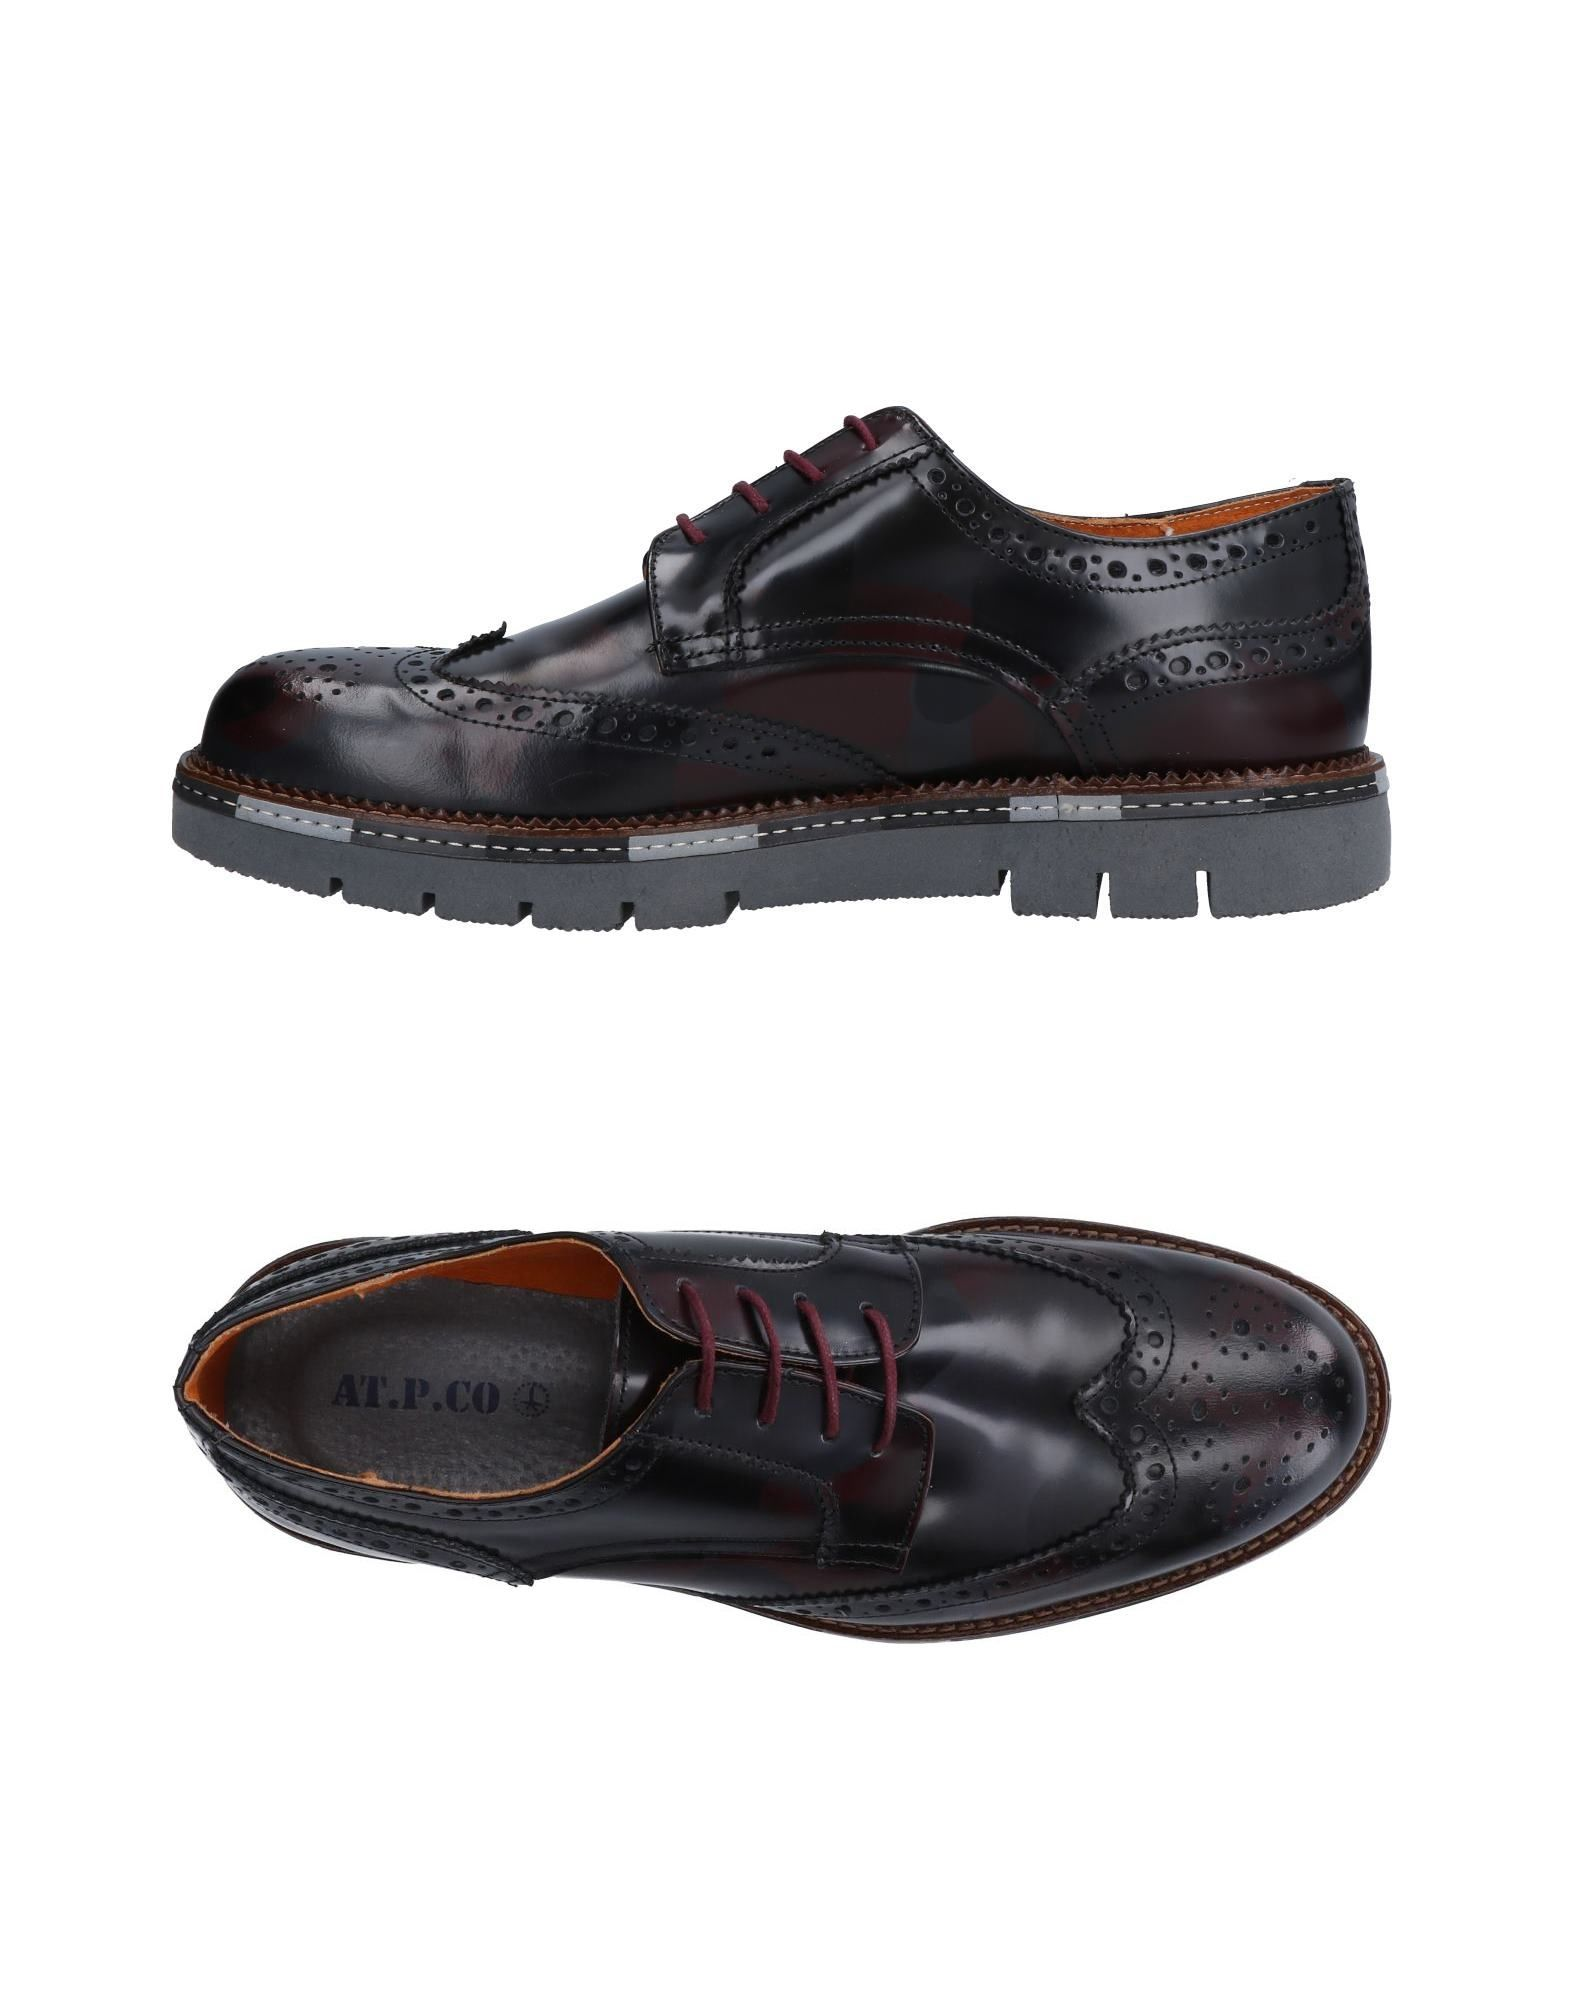 Rabatt Rabatt Rabatt echte Schuhe At.P.Co Schnürschuhe Herren  11505387CU 88a5d7